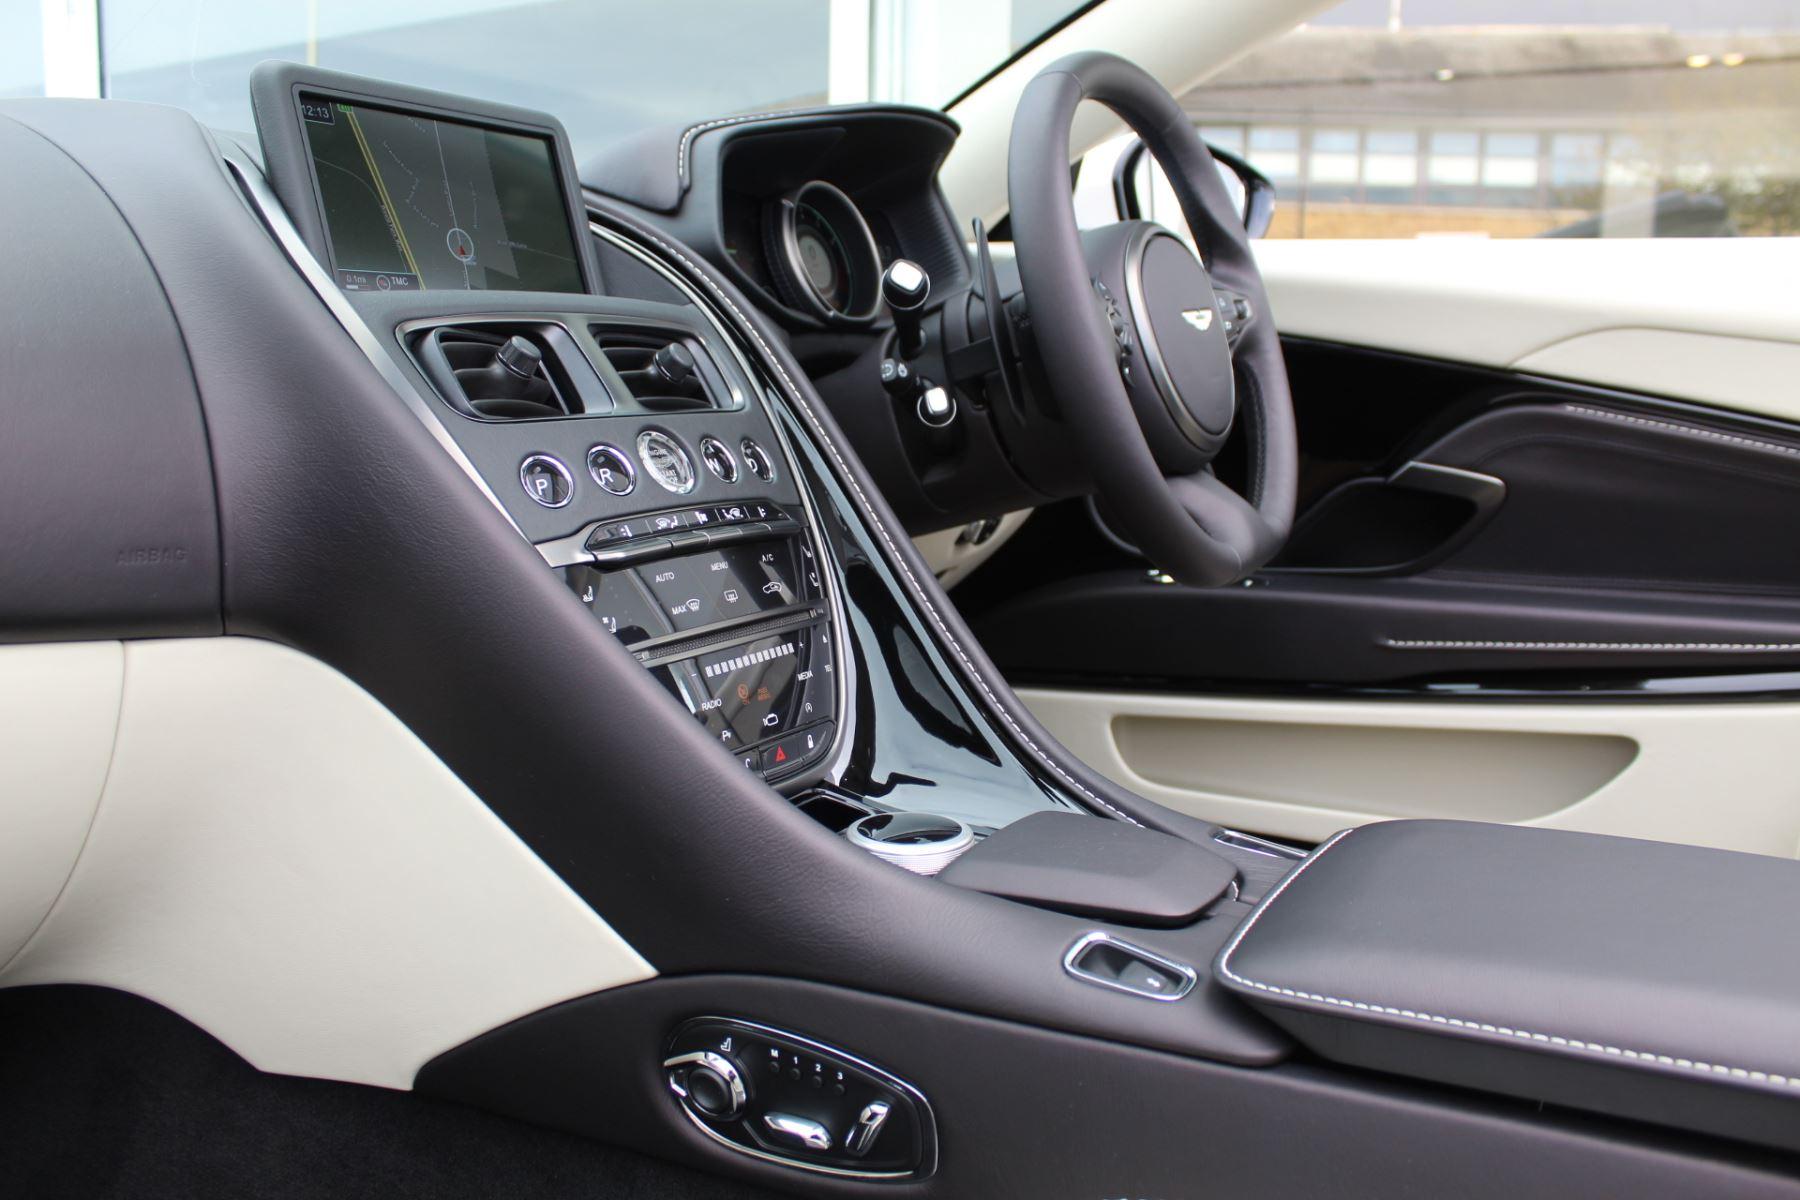 Aston Martin DB11 Volante V8 Twin Turbo image 7